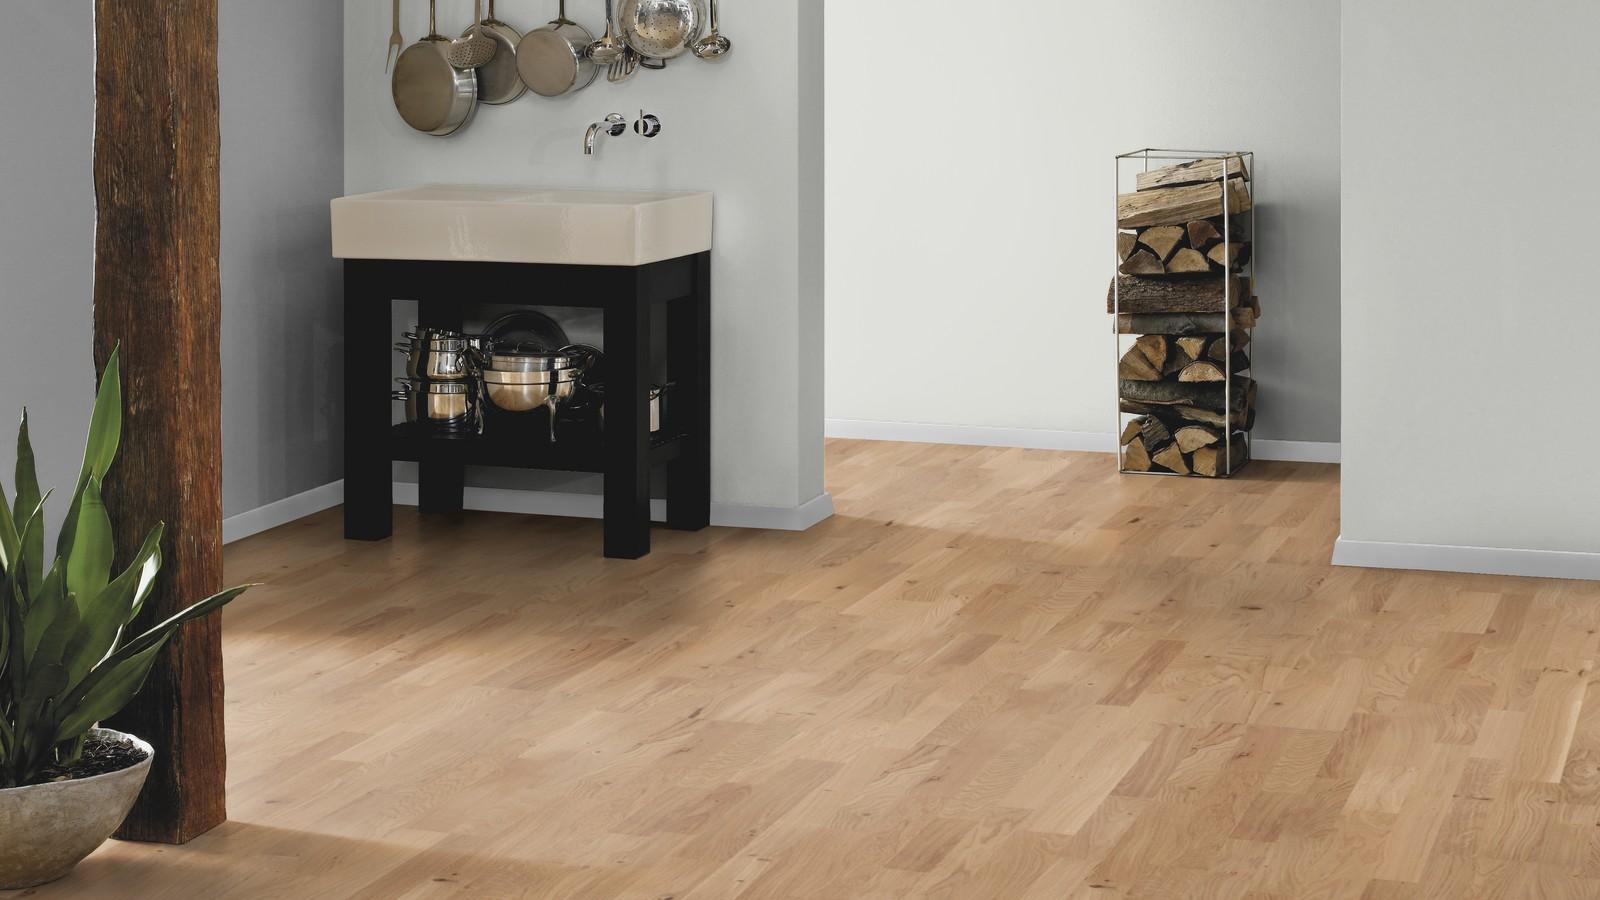 ter h rne bright collection l parkett l b29 eiche l schiffsboden preisbrecher. Black Bedroom Furniture Sets. Home Design Ideas